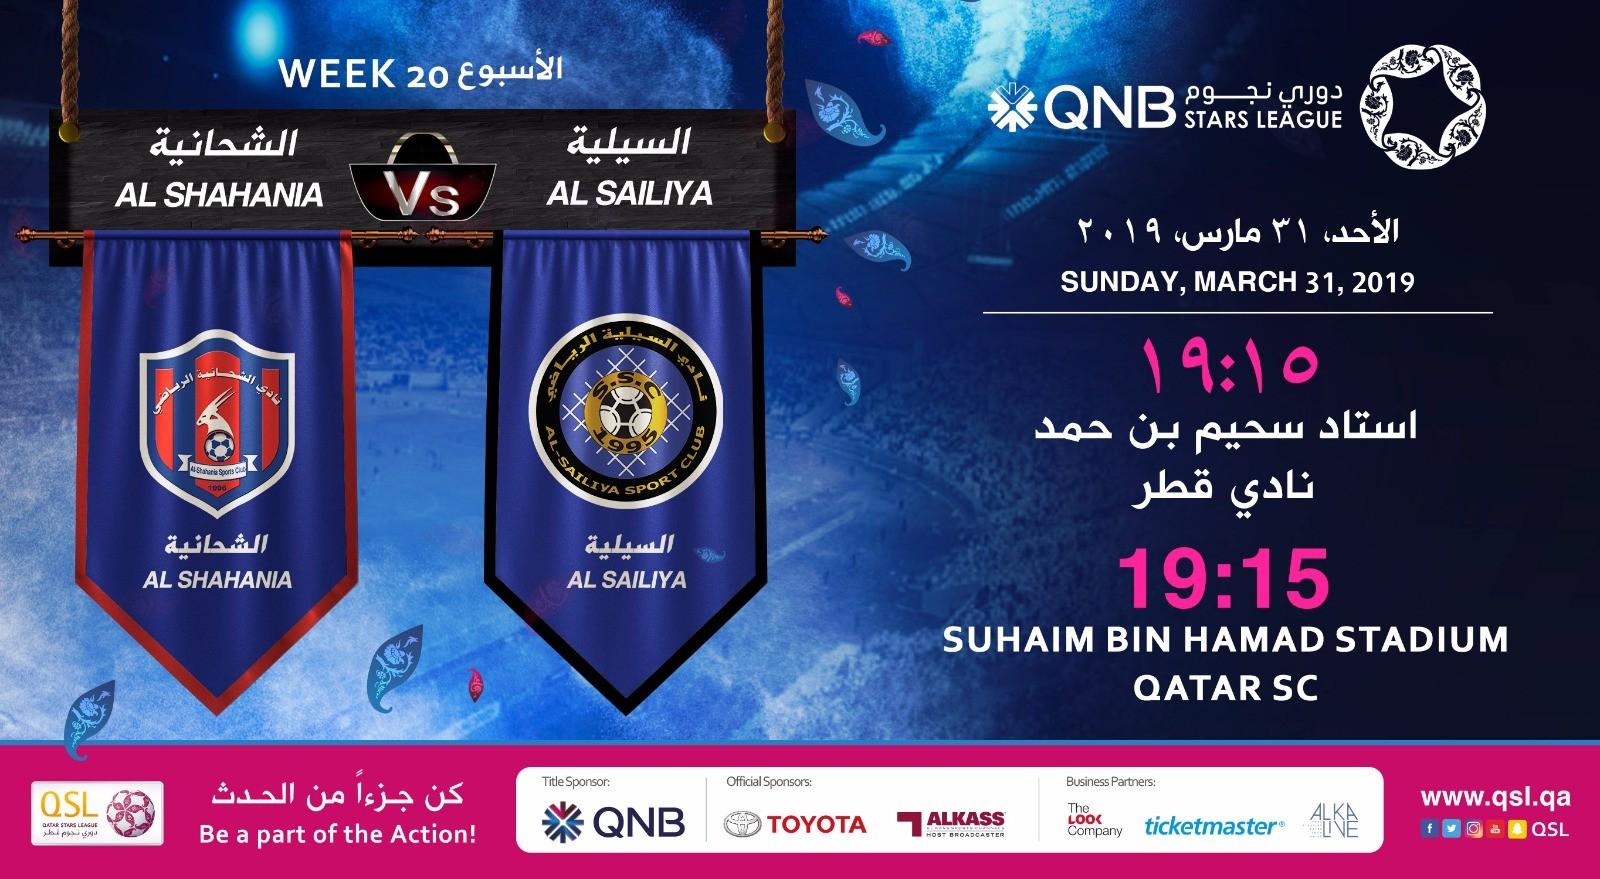 QNB Stars League Week 20 — Al Shahania vs Al Sailiya